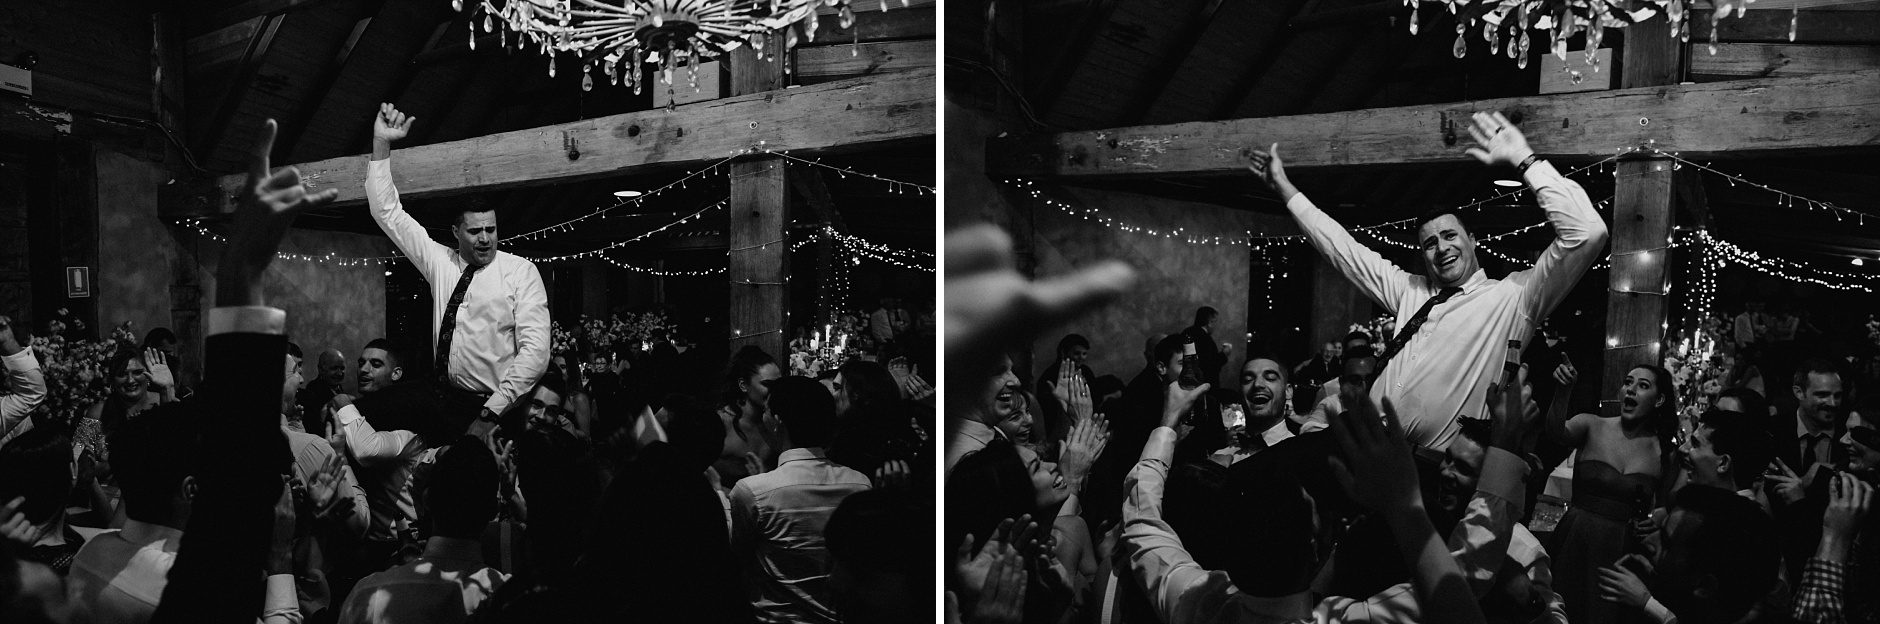 cassandra&cameron1310ab_Peppers-Creek-Wedding.jpg